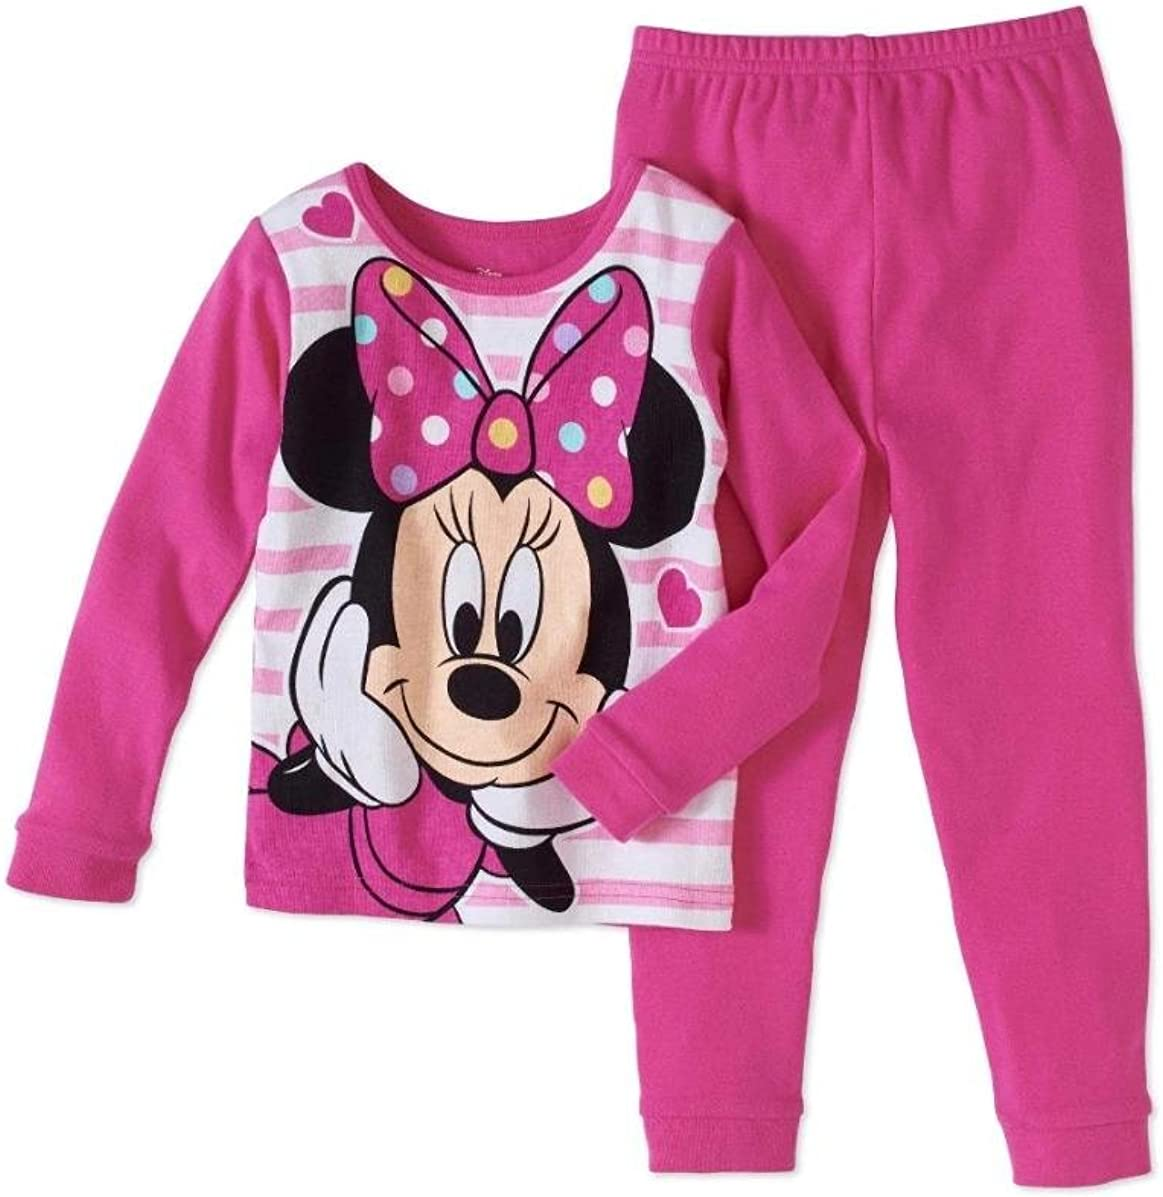 Size 12M-14Y Leveret Girls Stars Pajama Set 100/% Cotton